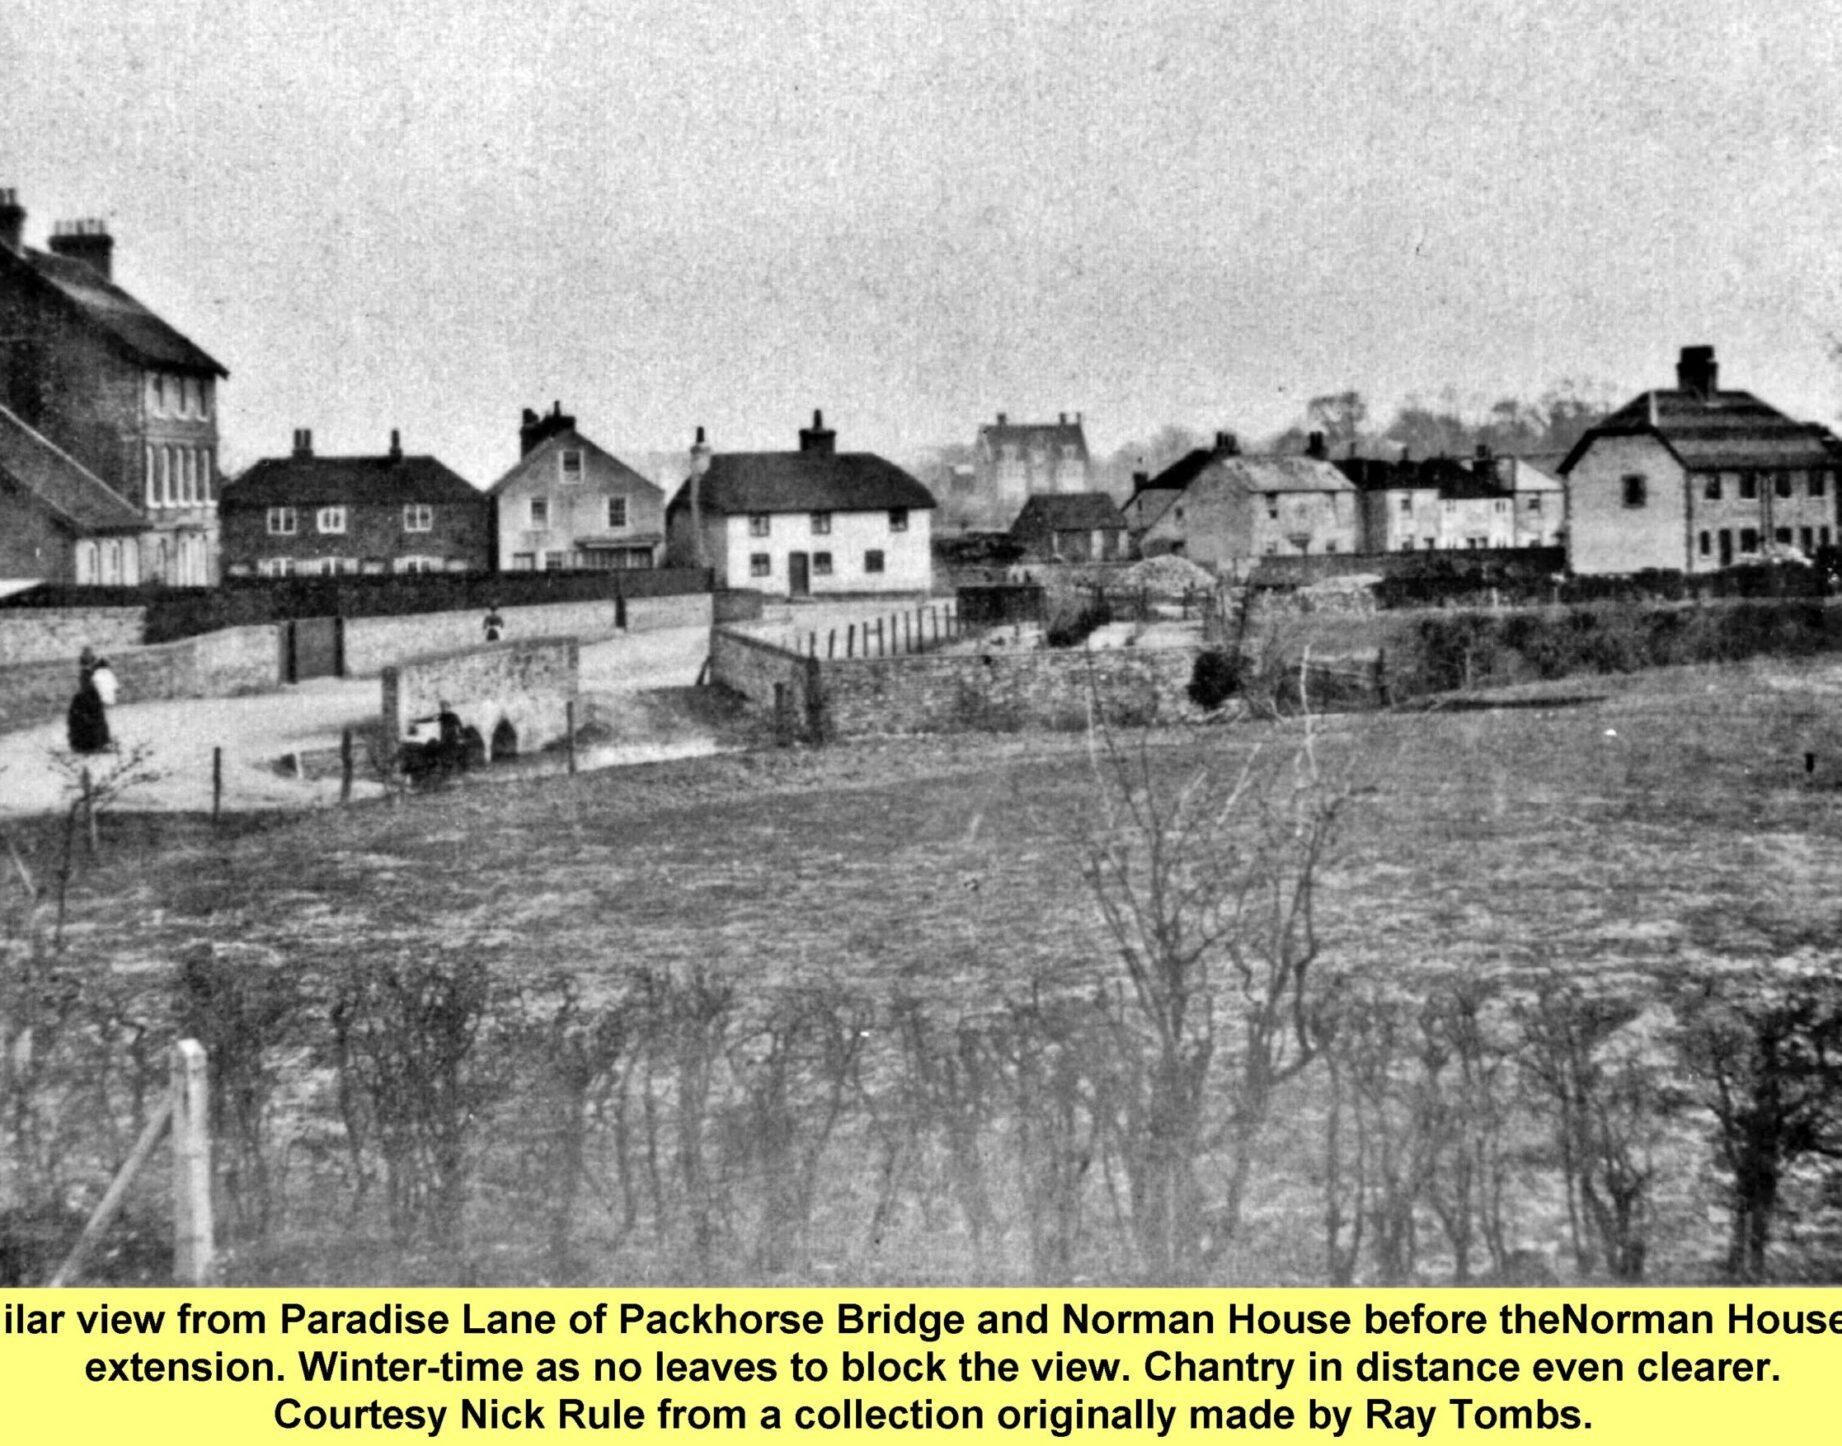 WESTBOURNE HISTORY PHOTO, PARADISE LANE, PACKHORSE, NORMAN HOUSE FARM, CHANTRY